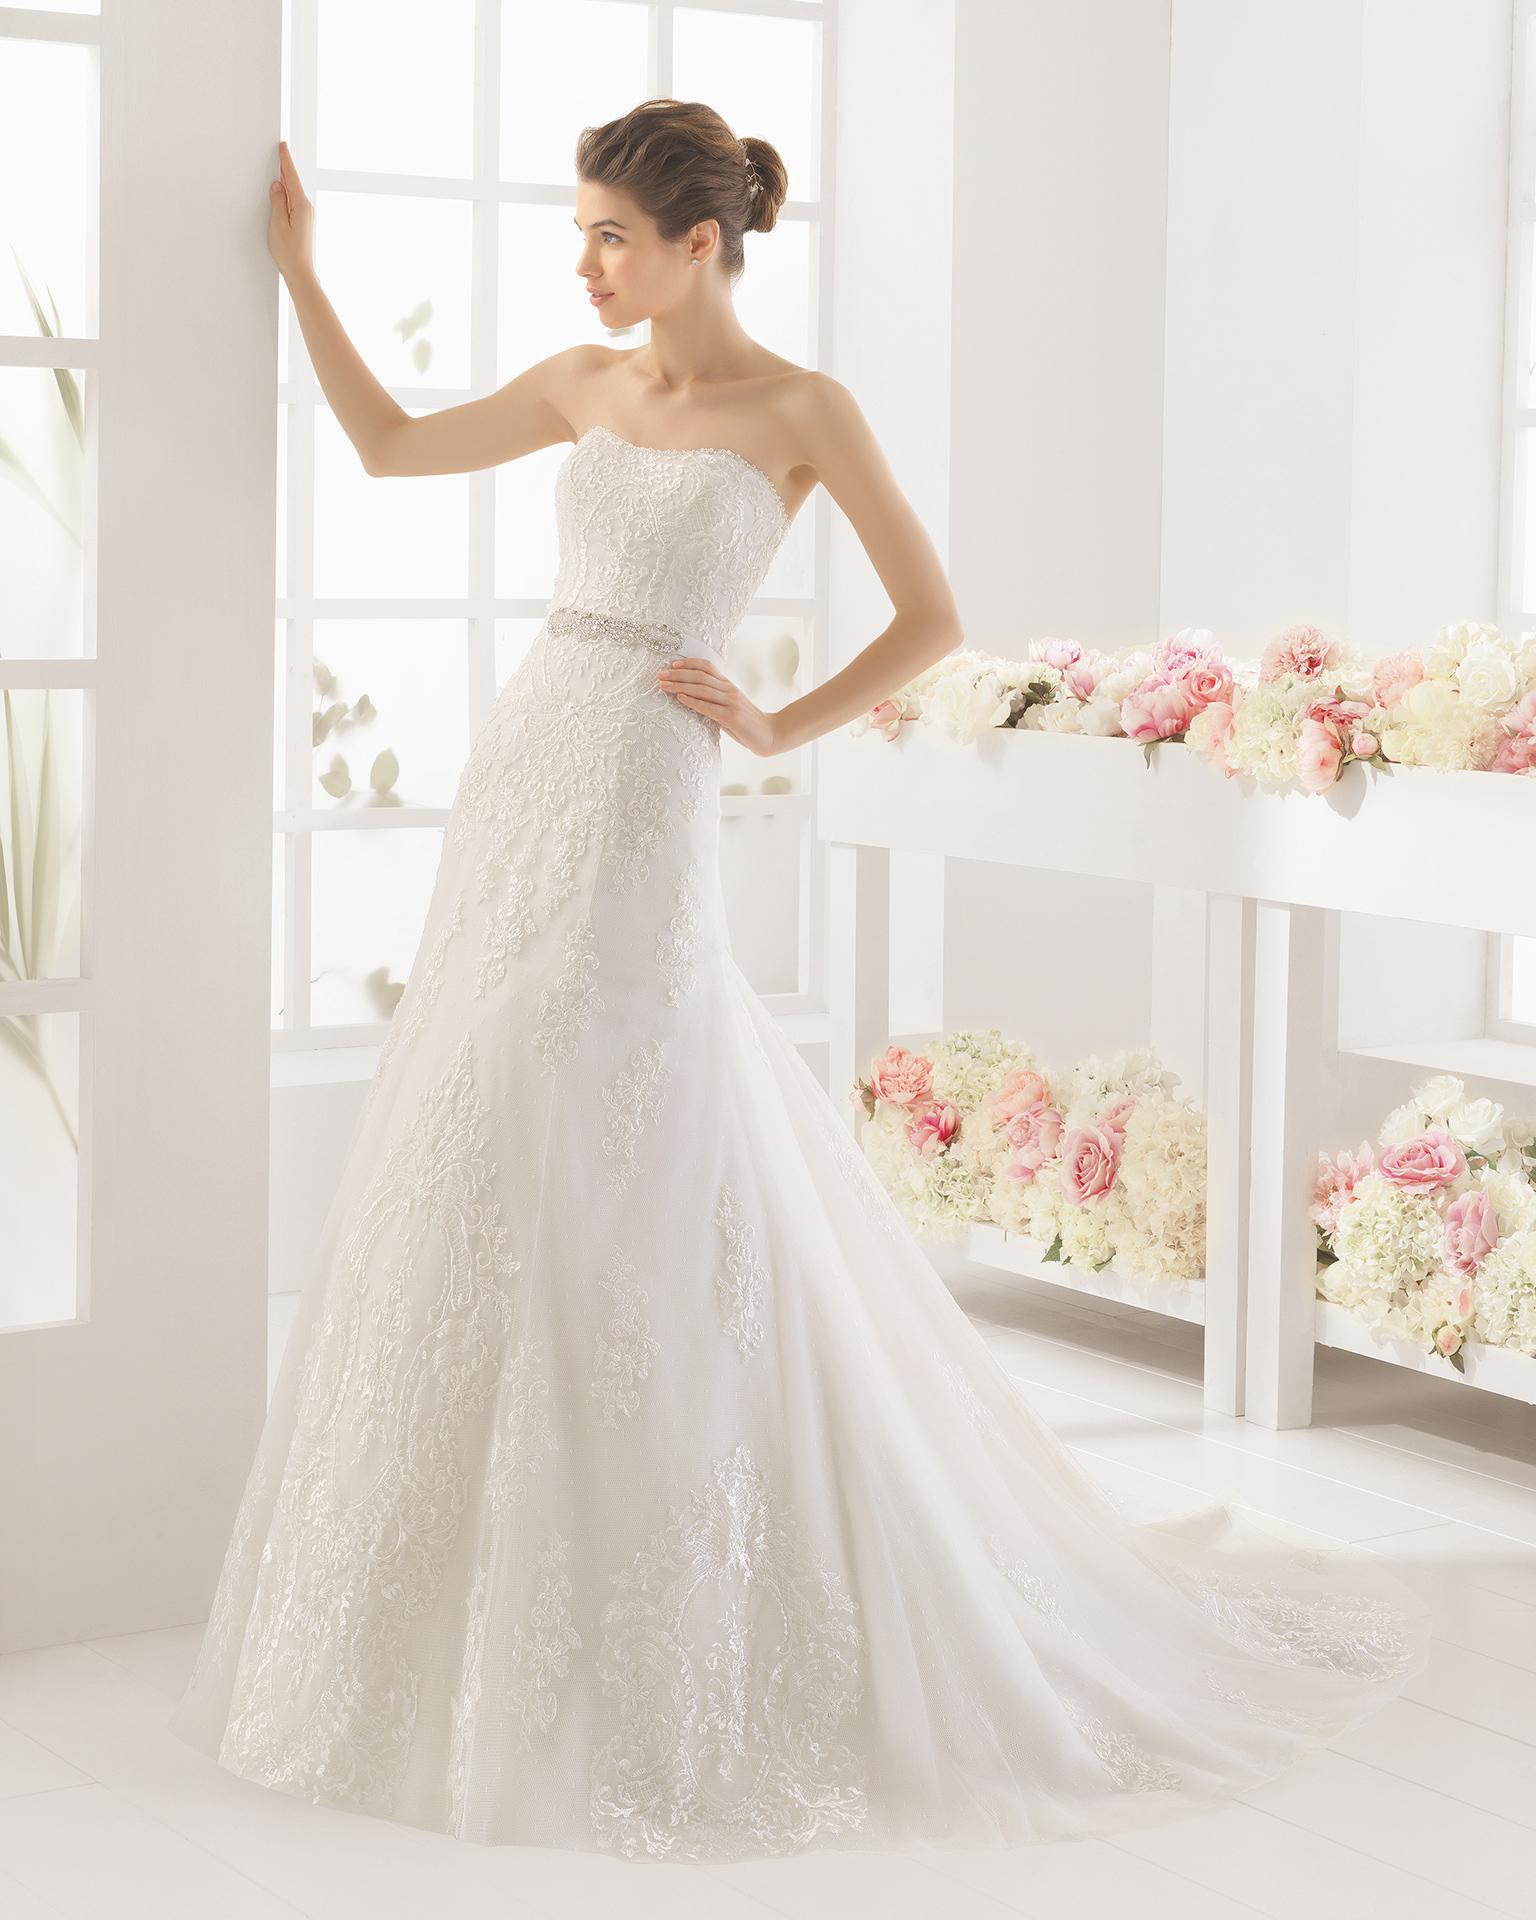 MAURICIO beaded lace wedding dress.